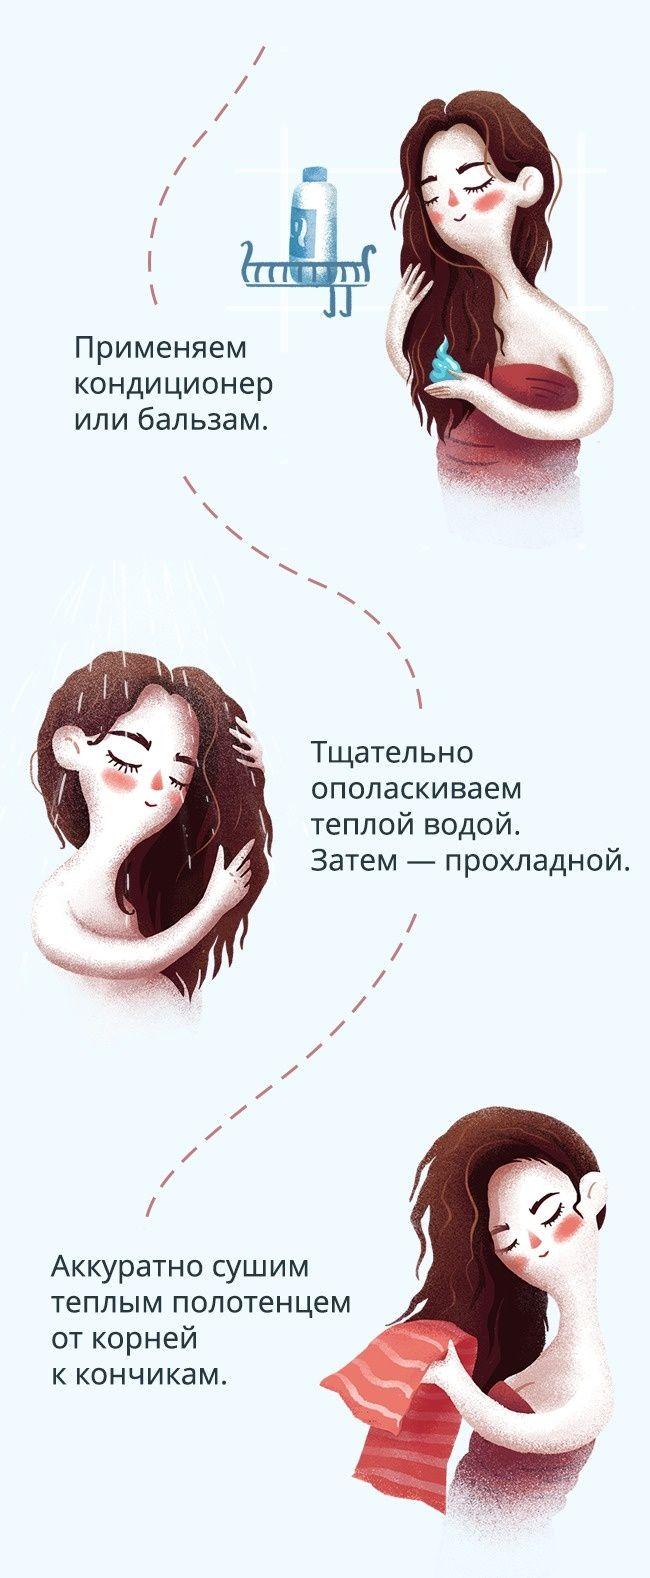 Лайфхаки по уходу за волосами реван палюх